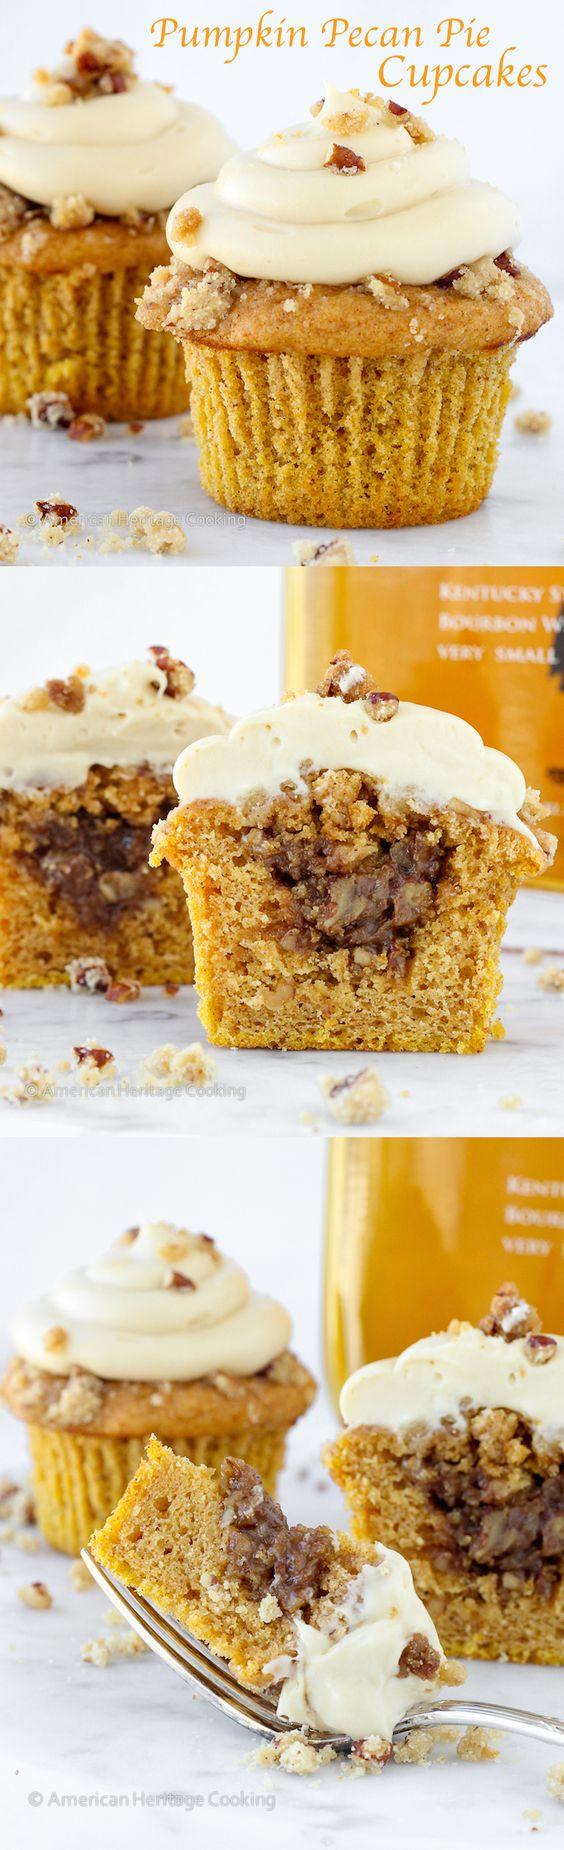 Pumpkin Pecan Pie Cupcakes (Bourbon Brown Sugar Cream Cheese Frosting)